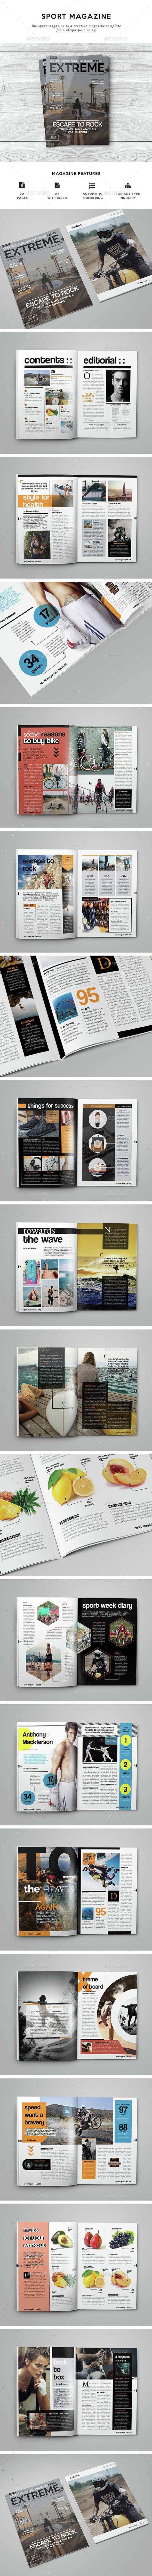 Sport Magazine #indesign #Template | Magazine Layout | Pinterest ...